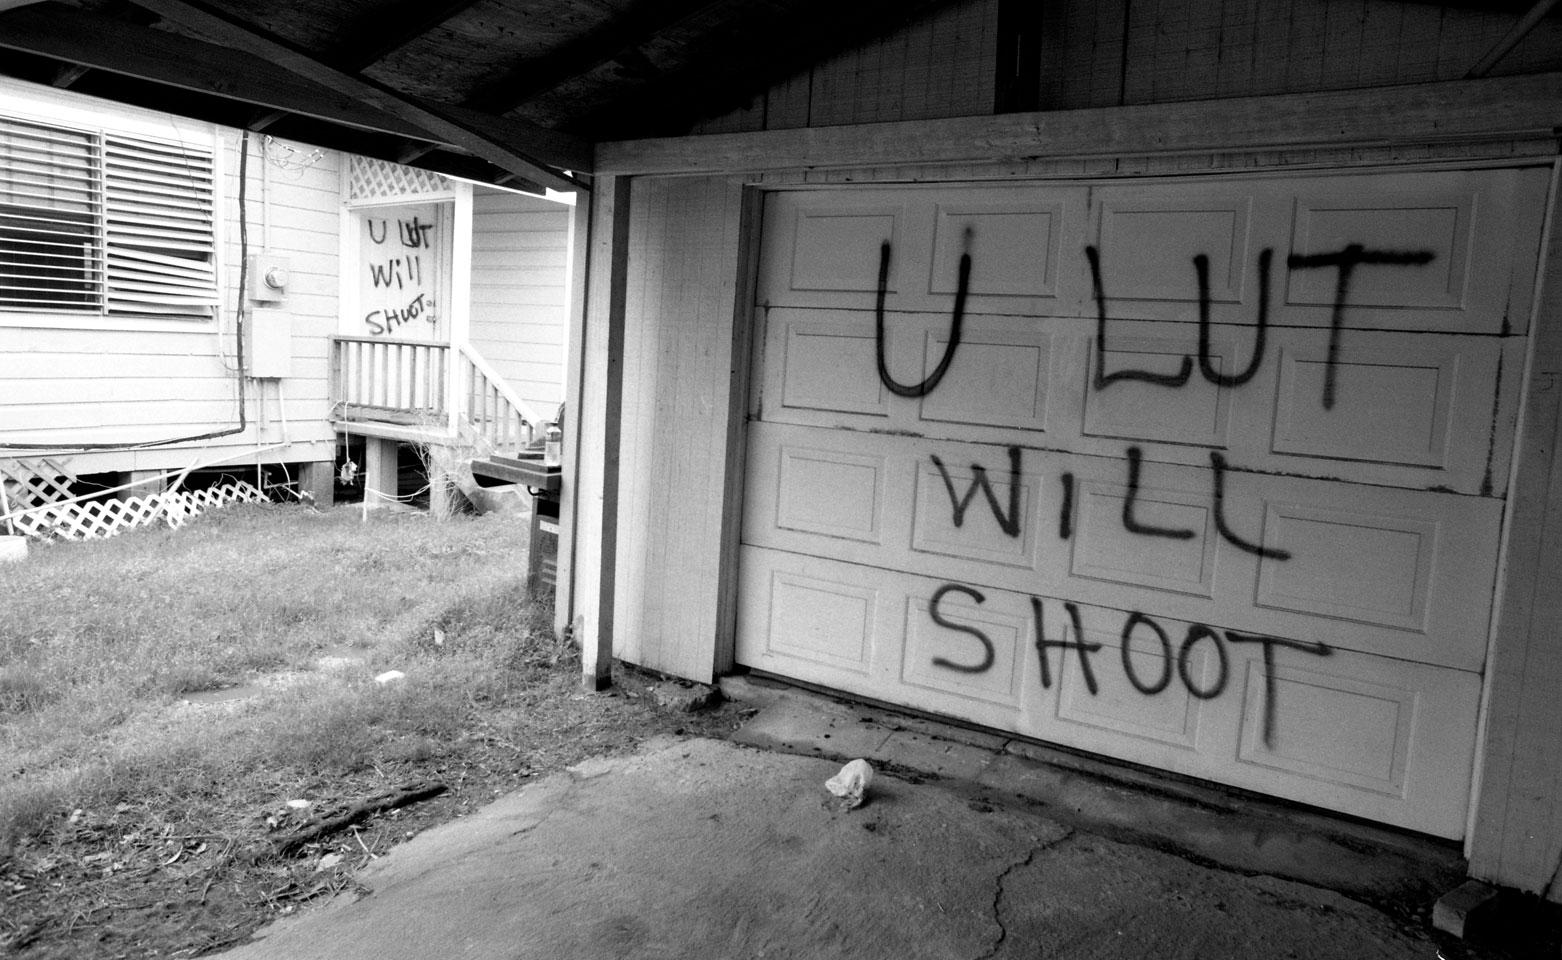 U Lut Will Shoot